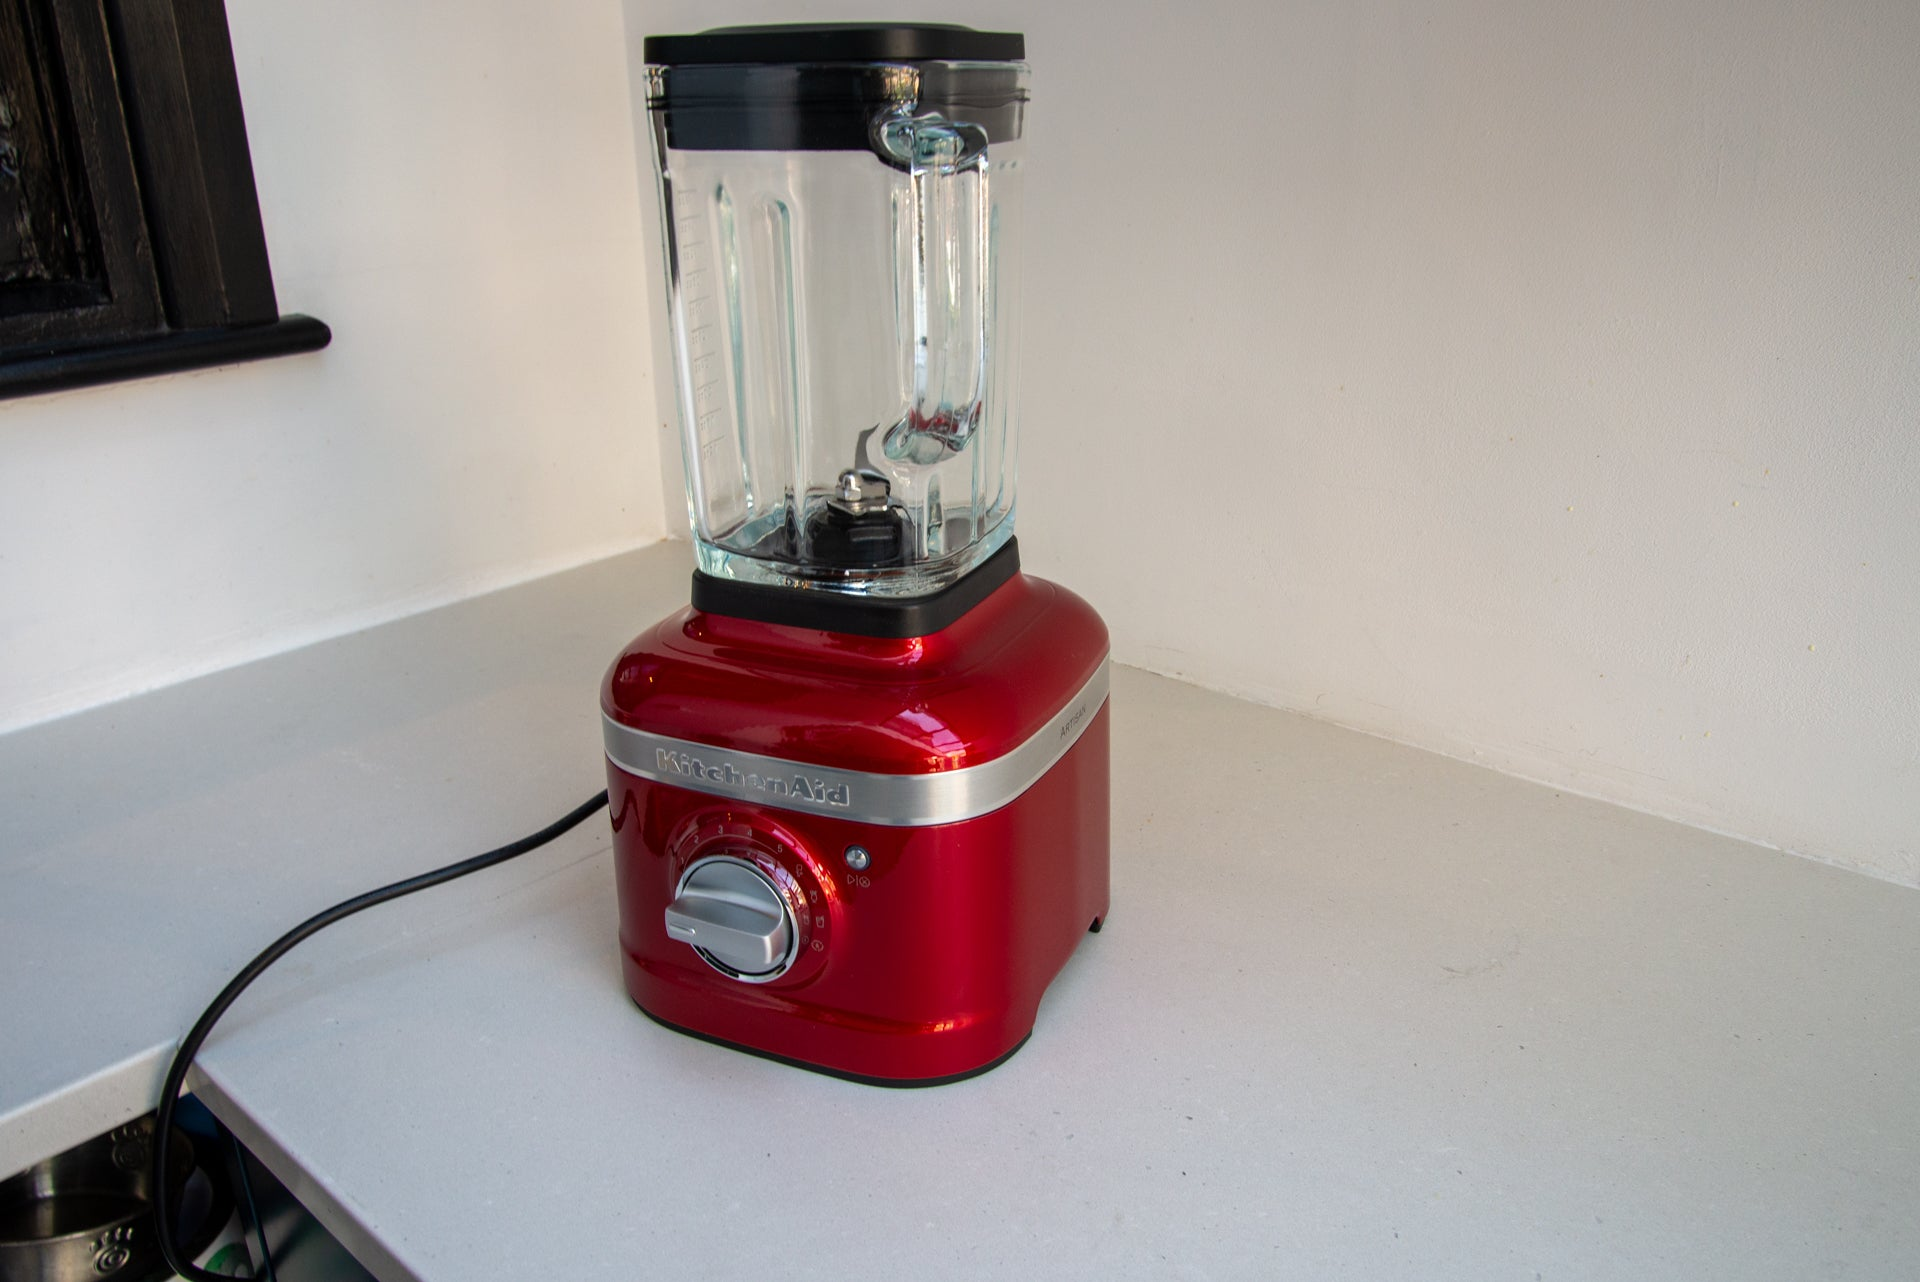 KitchenAid Artisan Blender K400 side